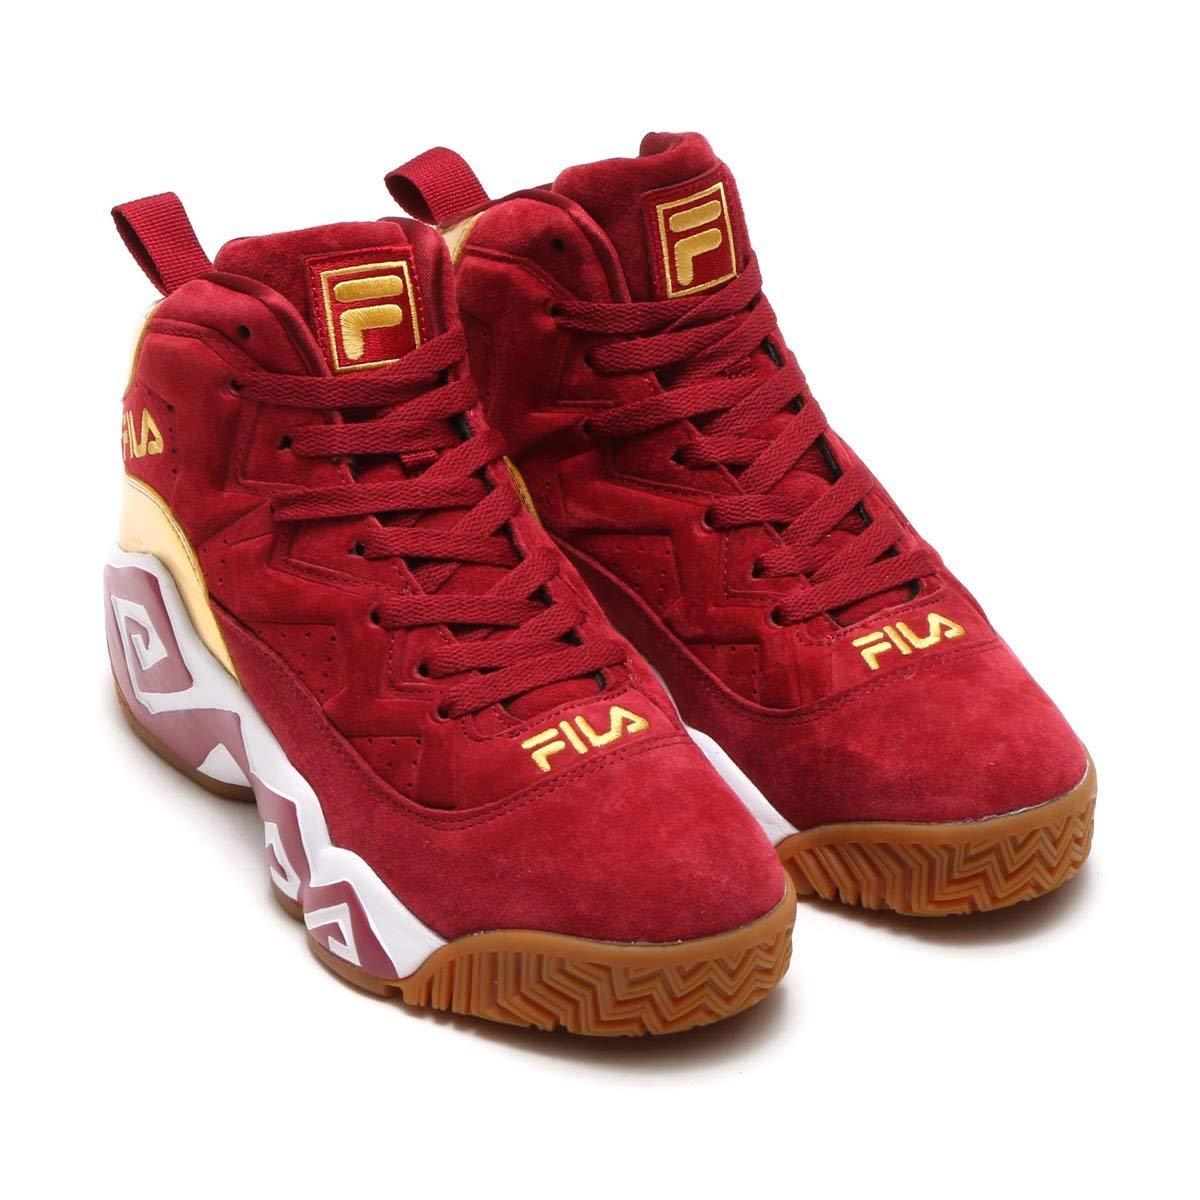 Buy Fila Men s Mash Burn Sneaker at